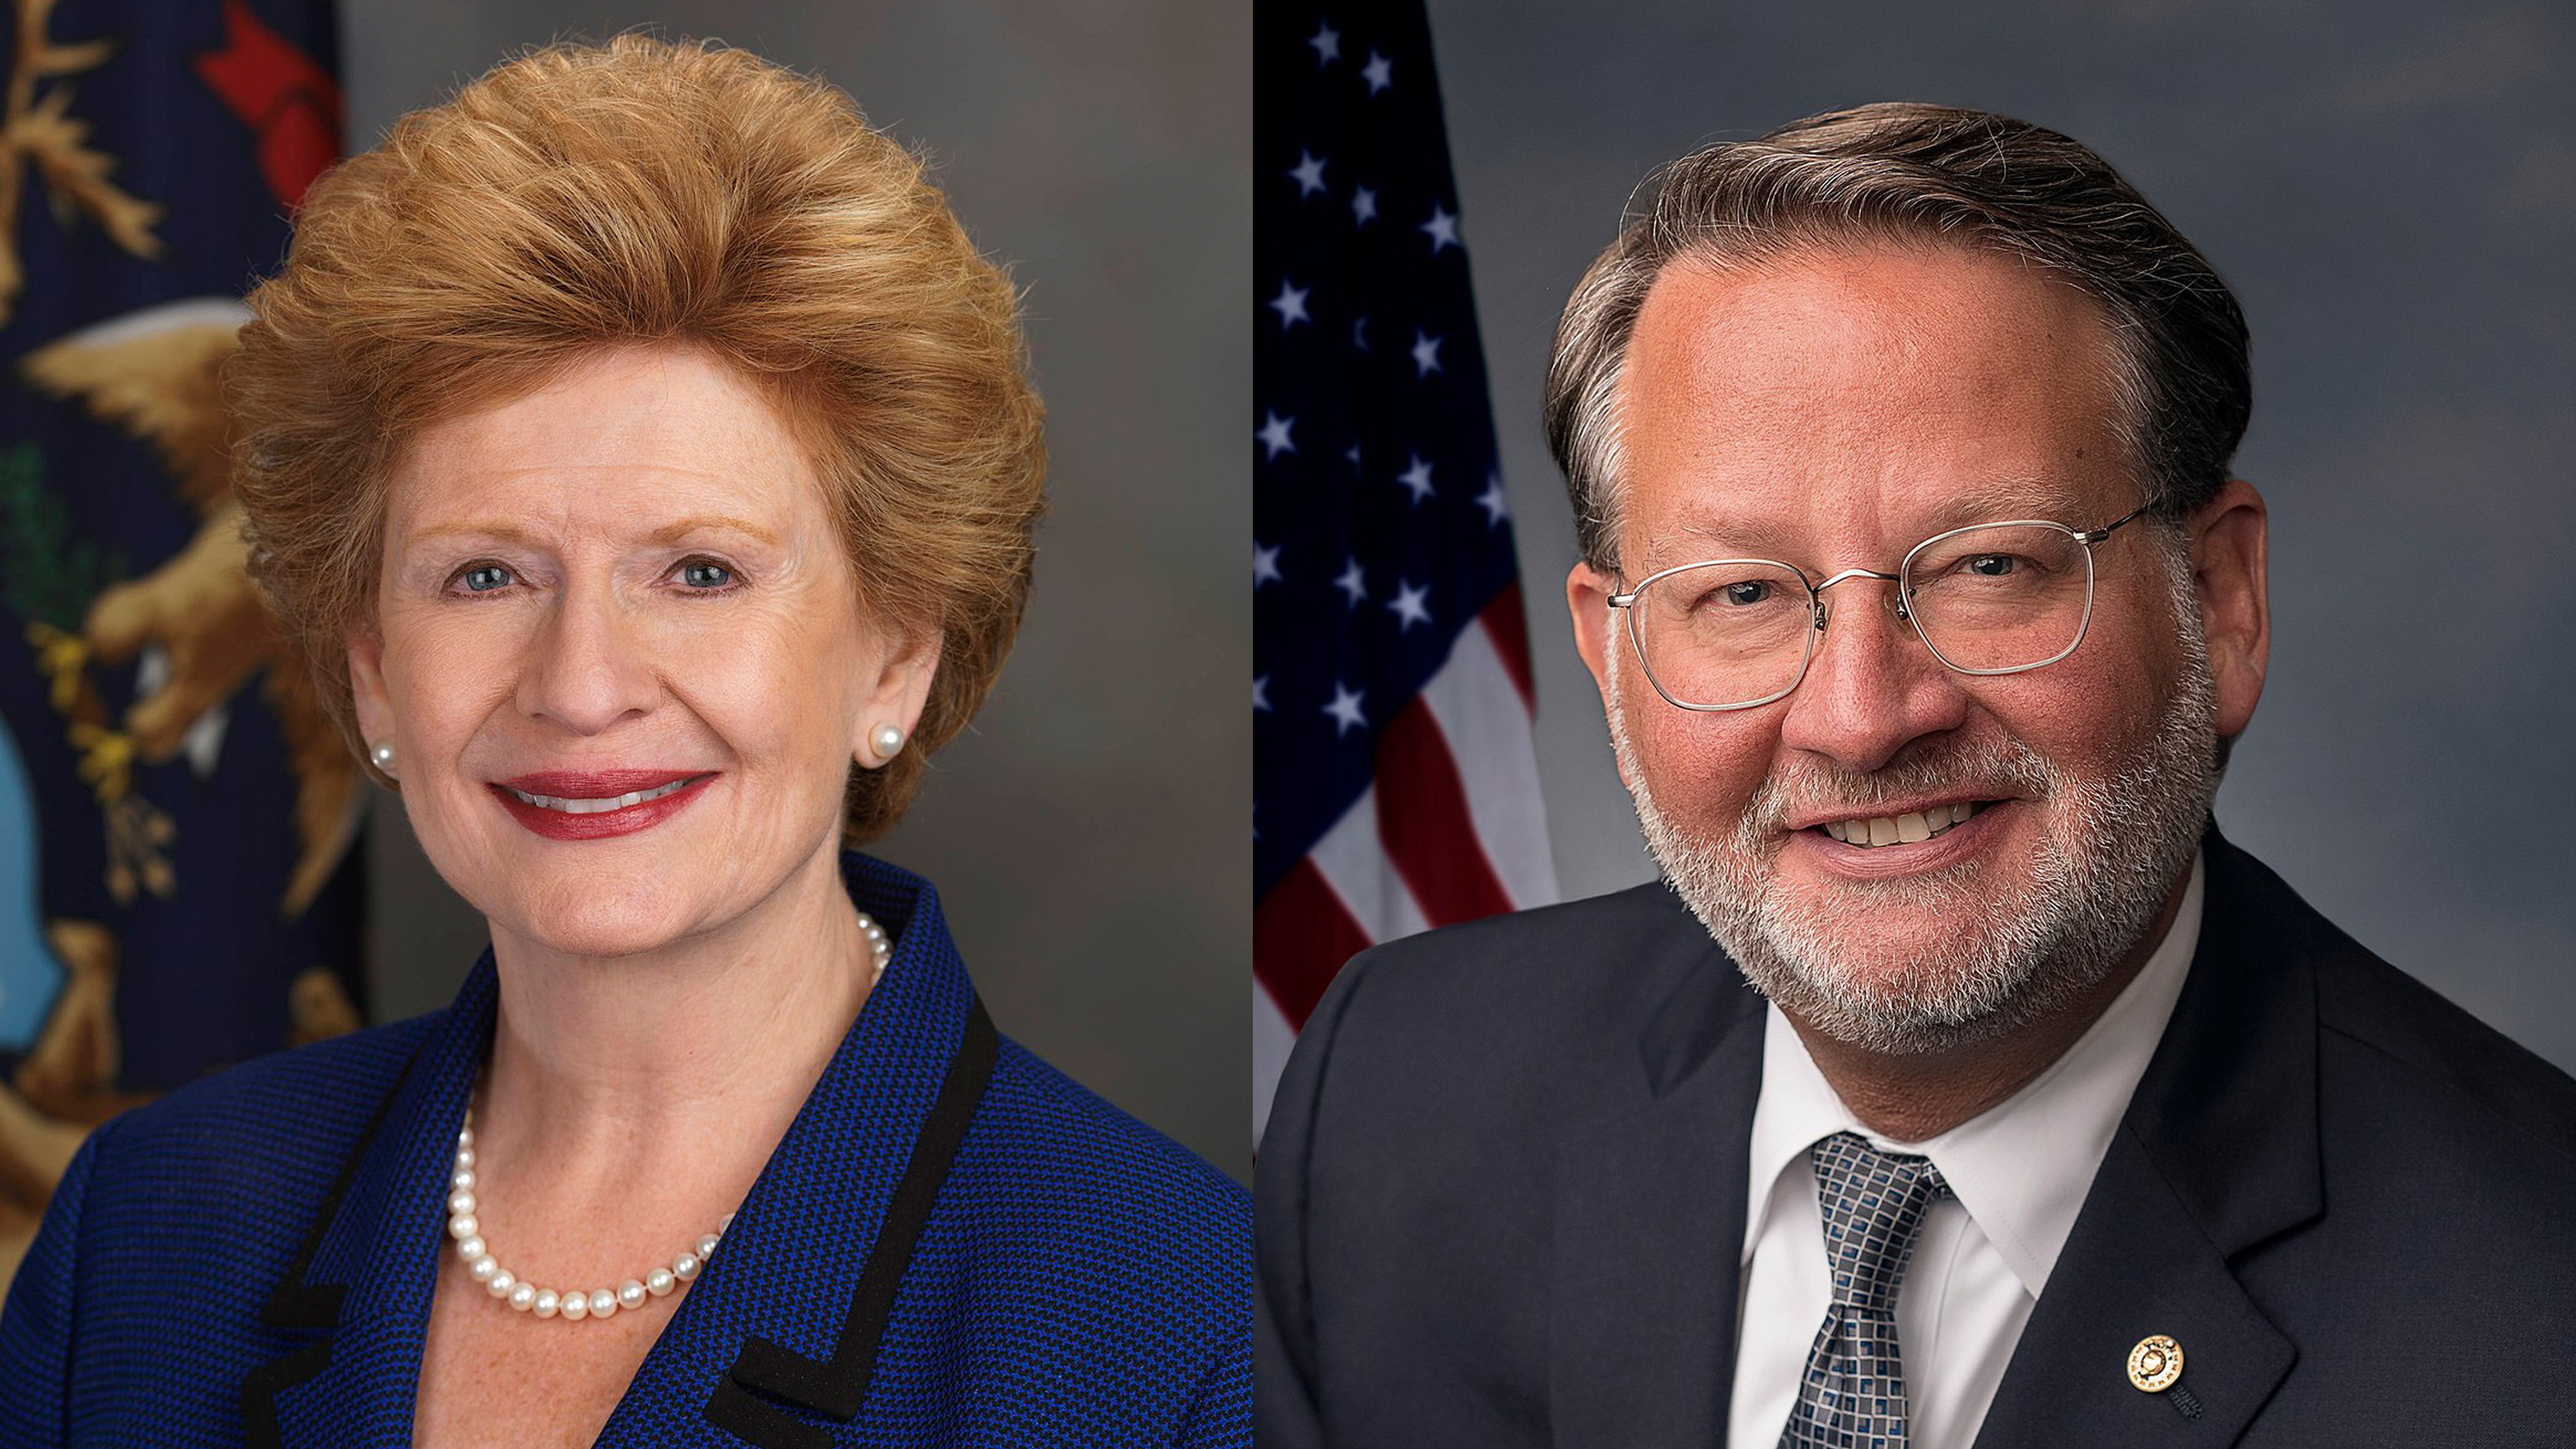 Michigan Senators Discuss Strategies to Help Residents